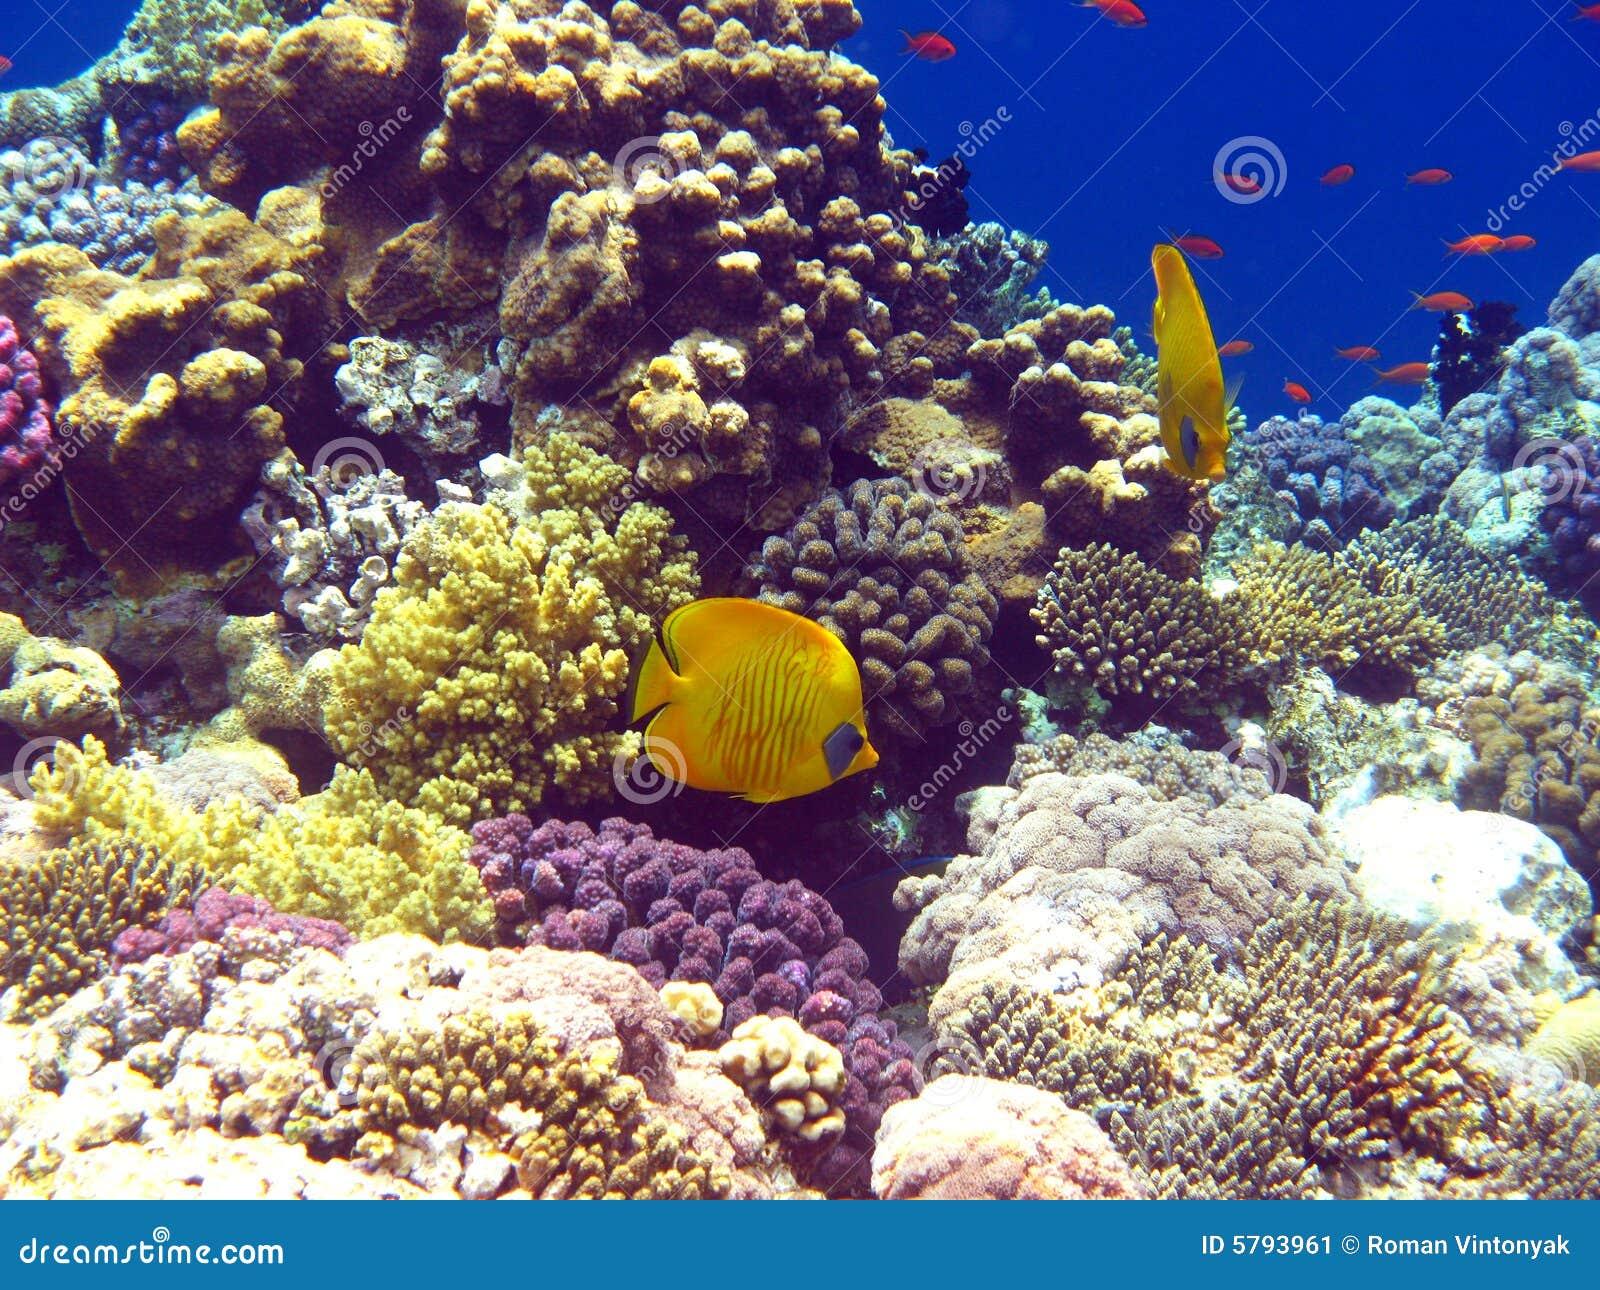 Récif coralien en Mer Rouge